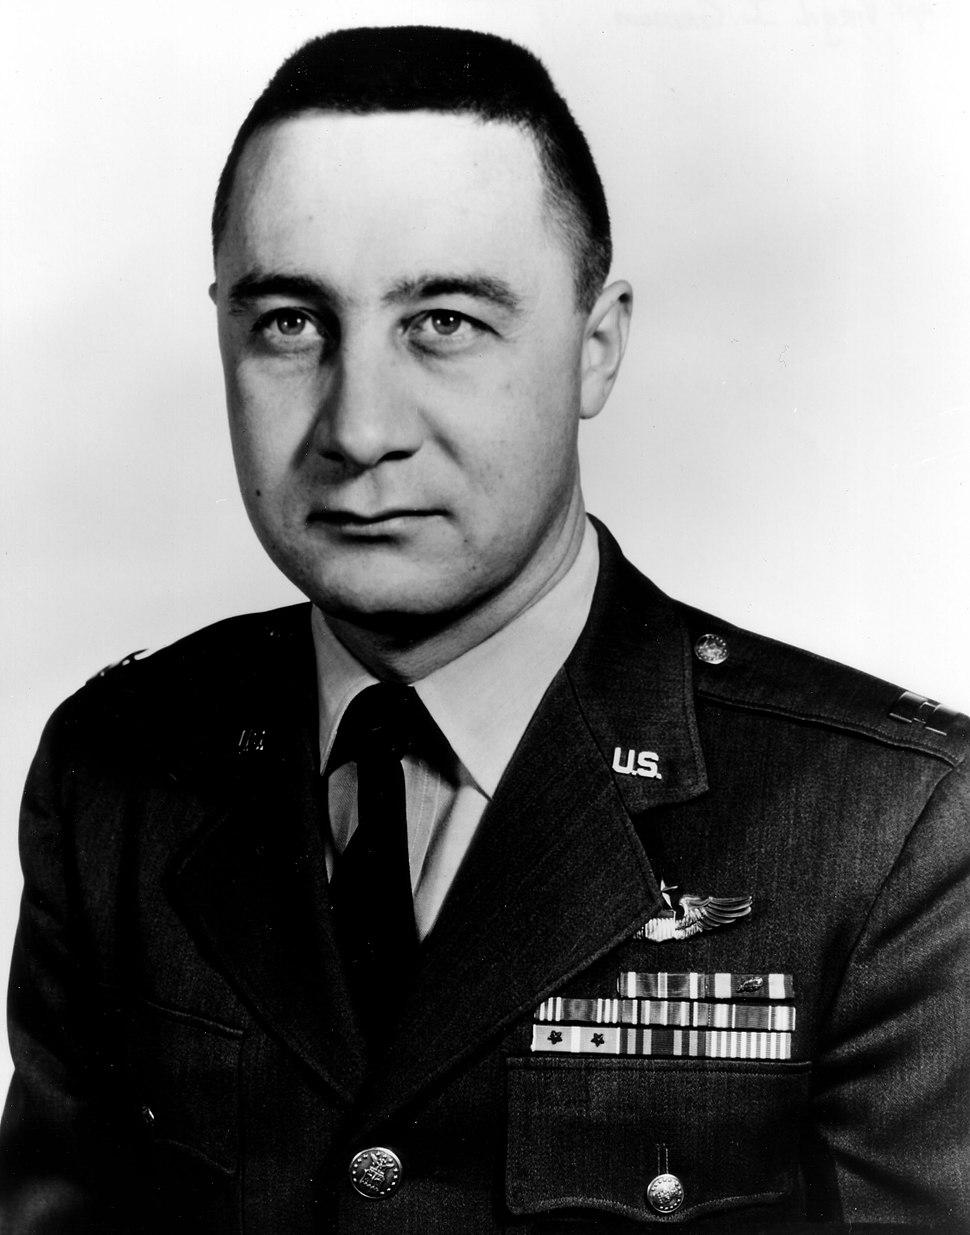 Gus Grissom photo portrait head and shoulders